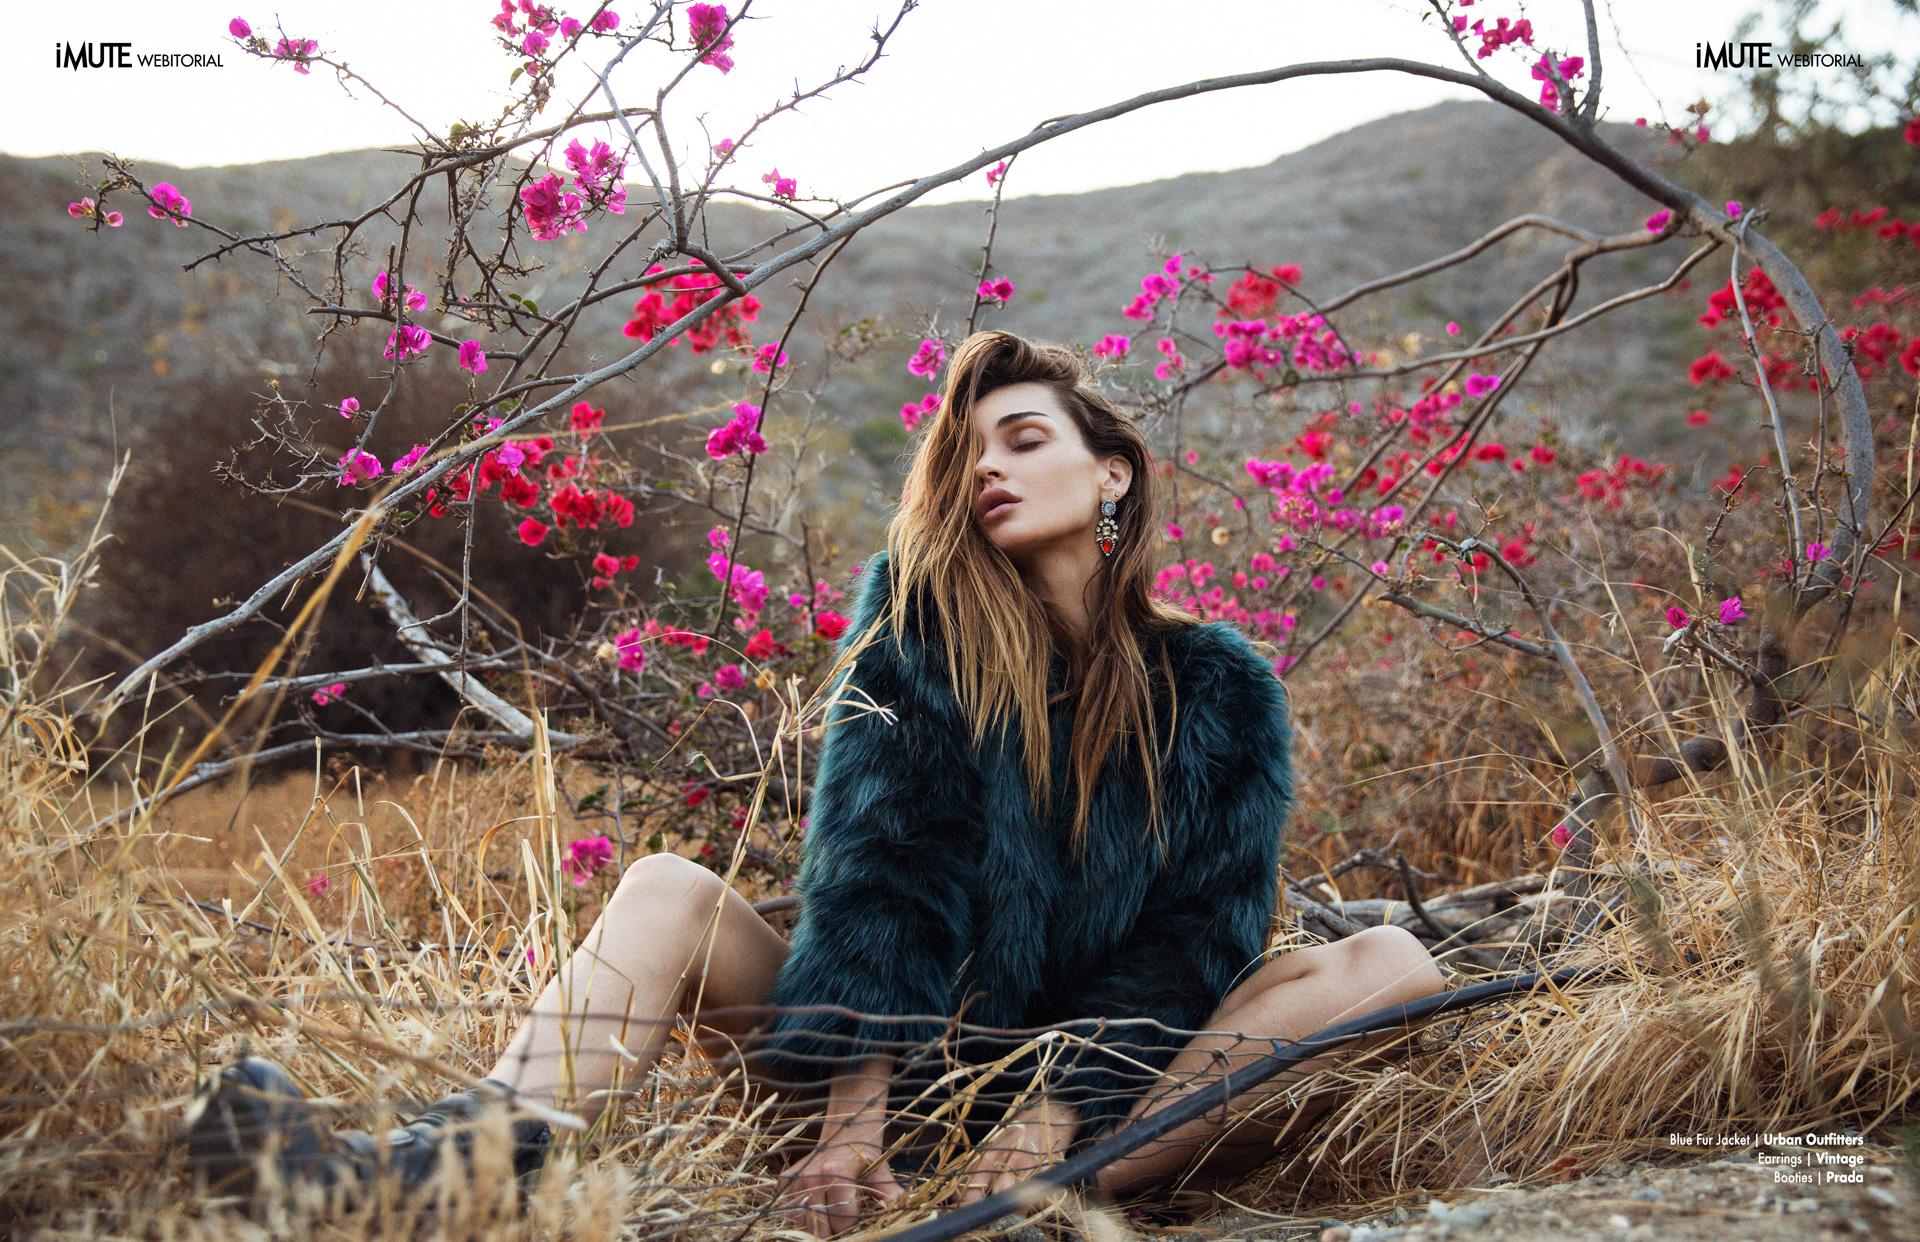 Allie webitorial for iMute Magazine Photographer | Andrew Parsons Model | Allie Crandell @ Photogenics LA Stylist | Kim Brooks